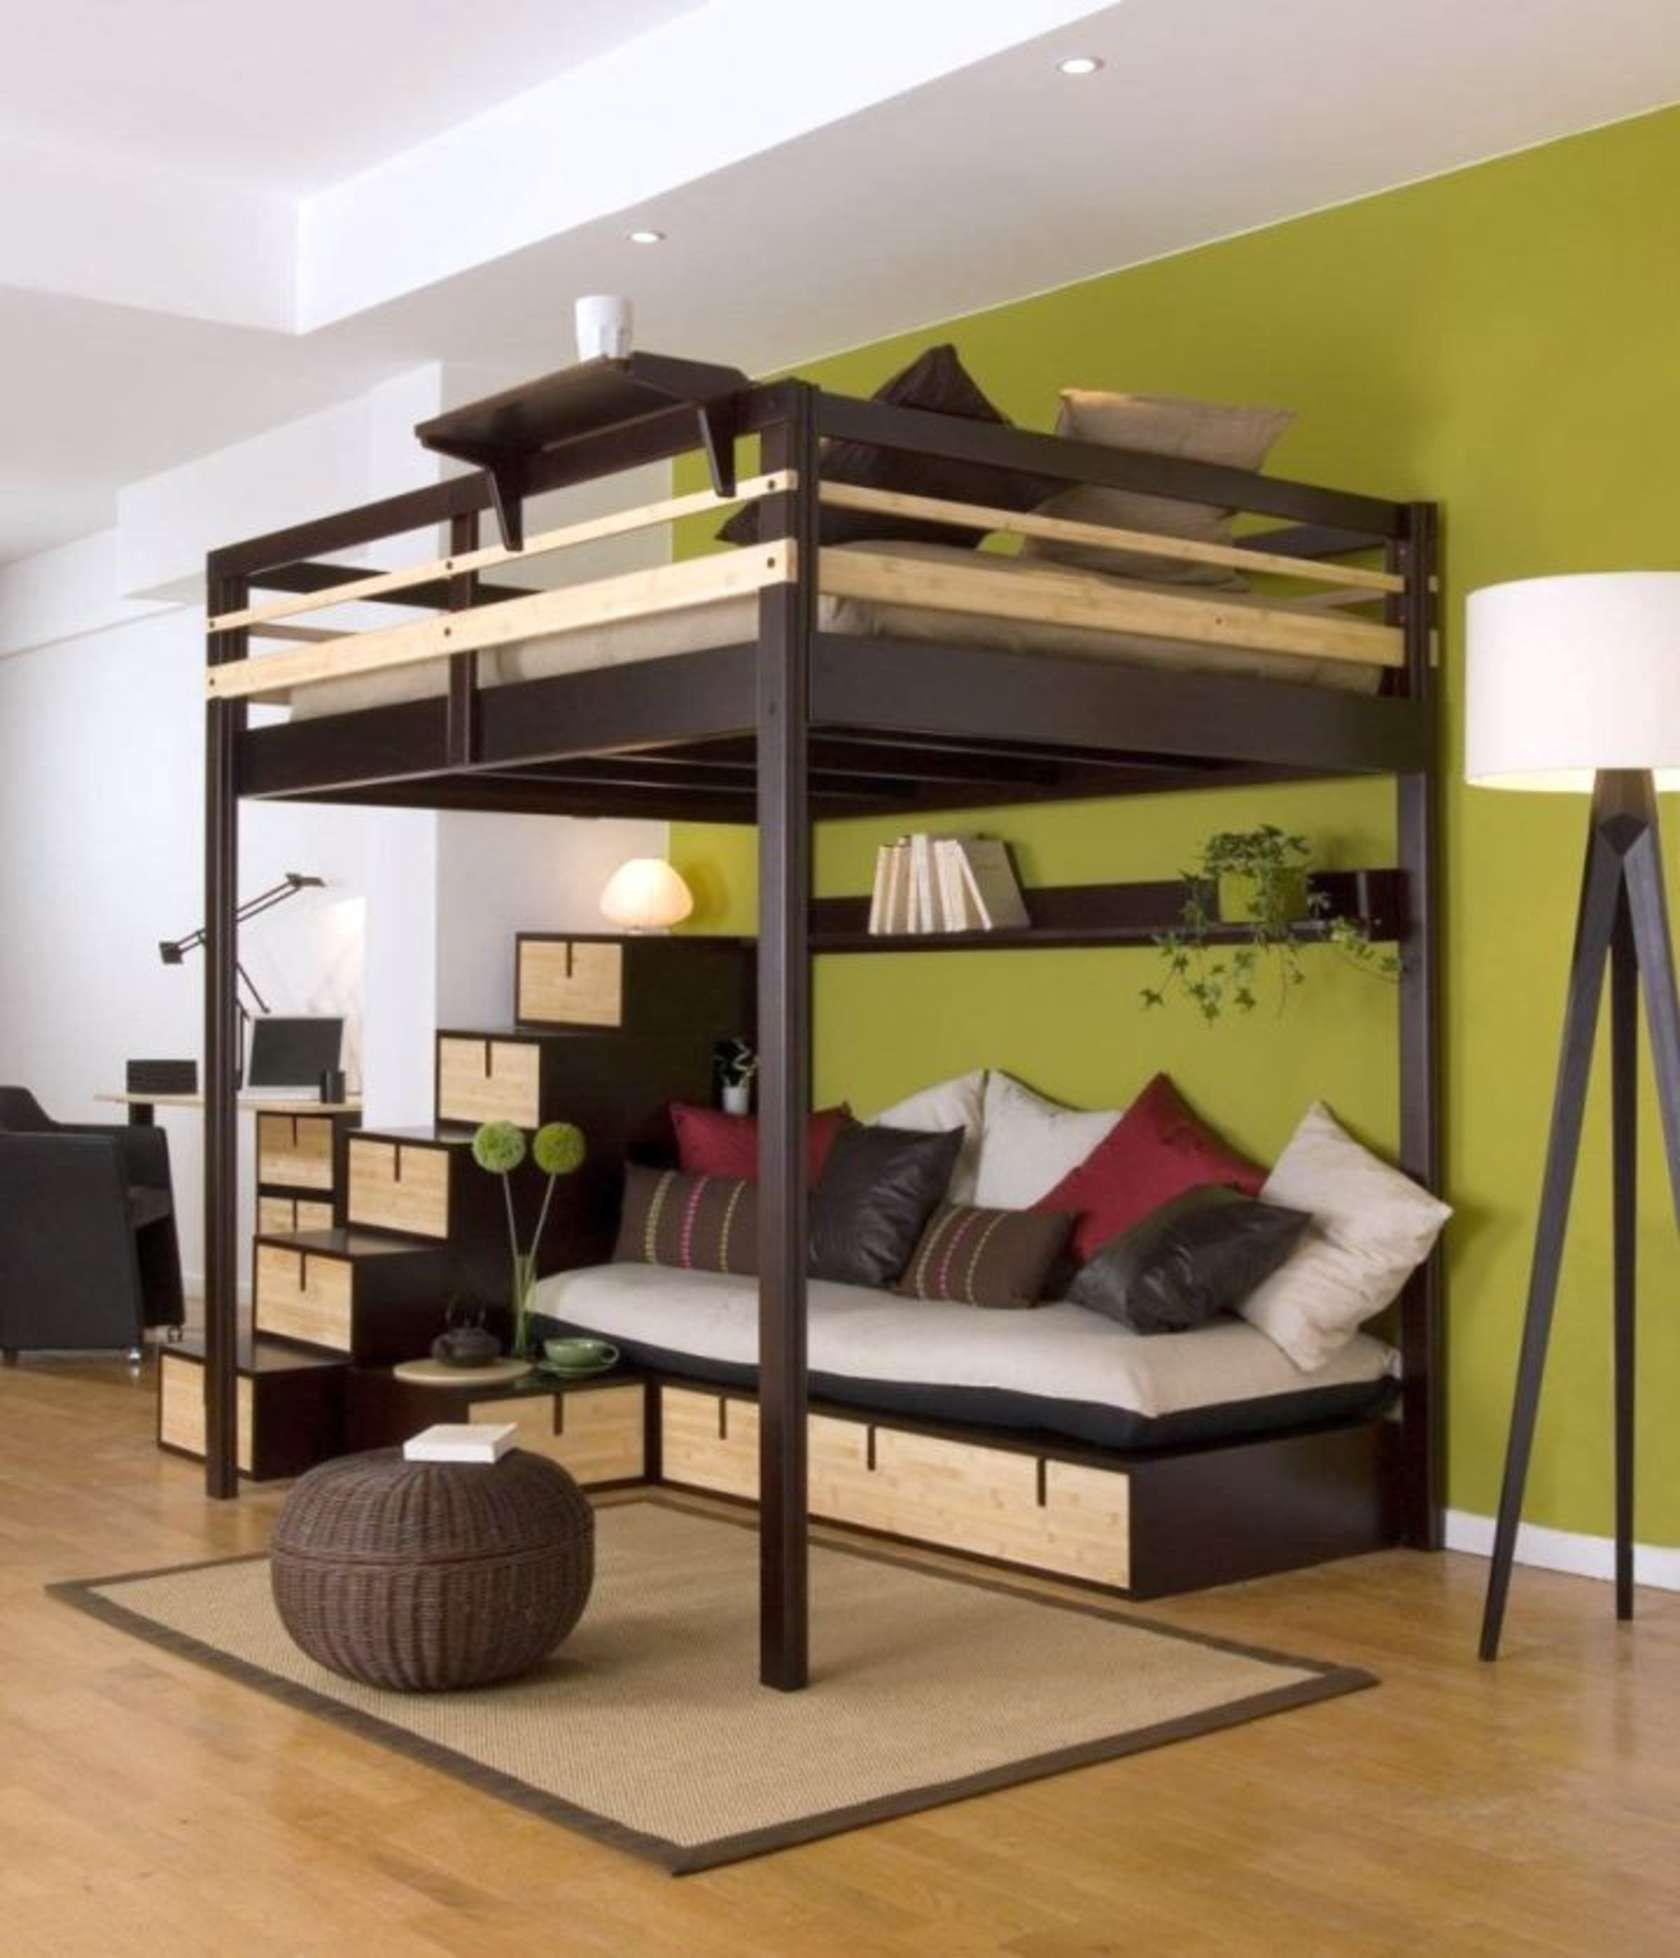 Super Cool Loft Beds For Grownups